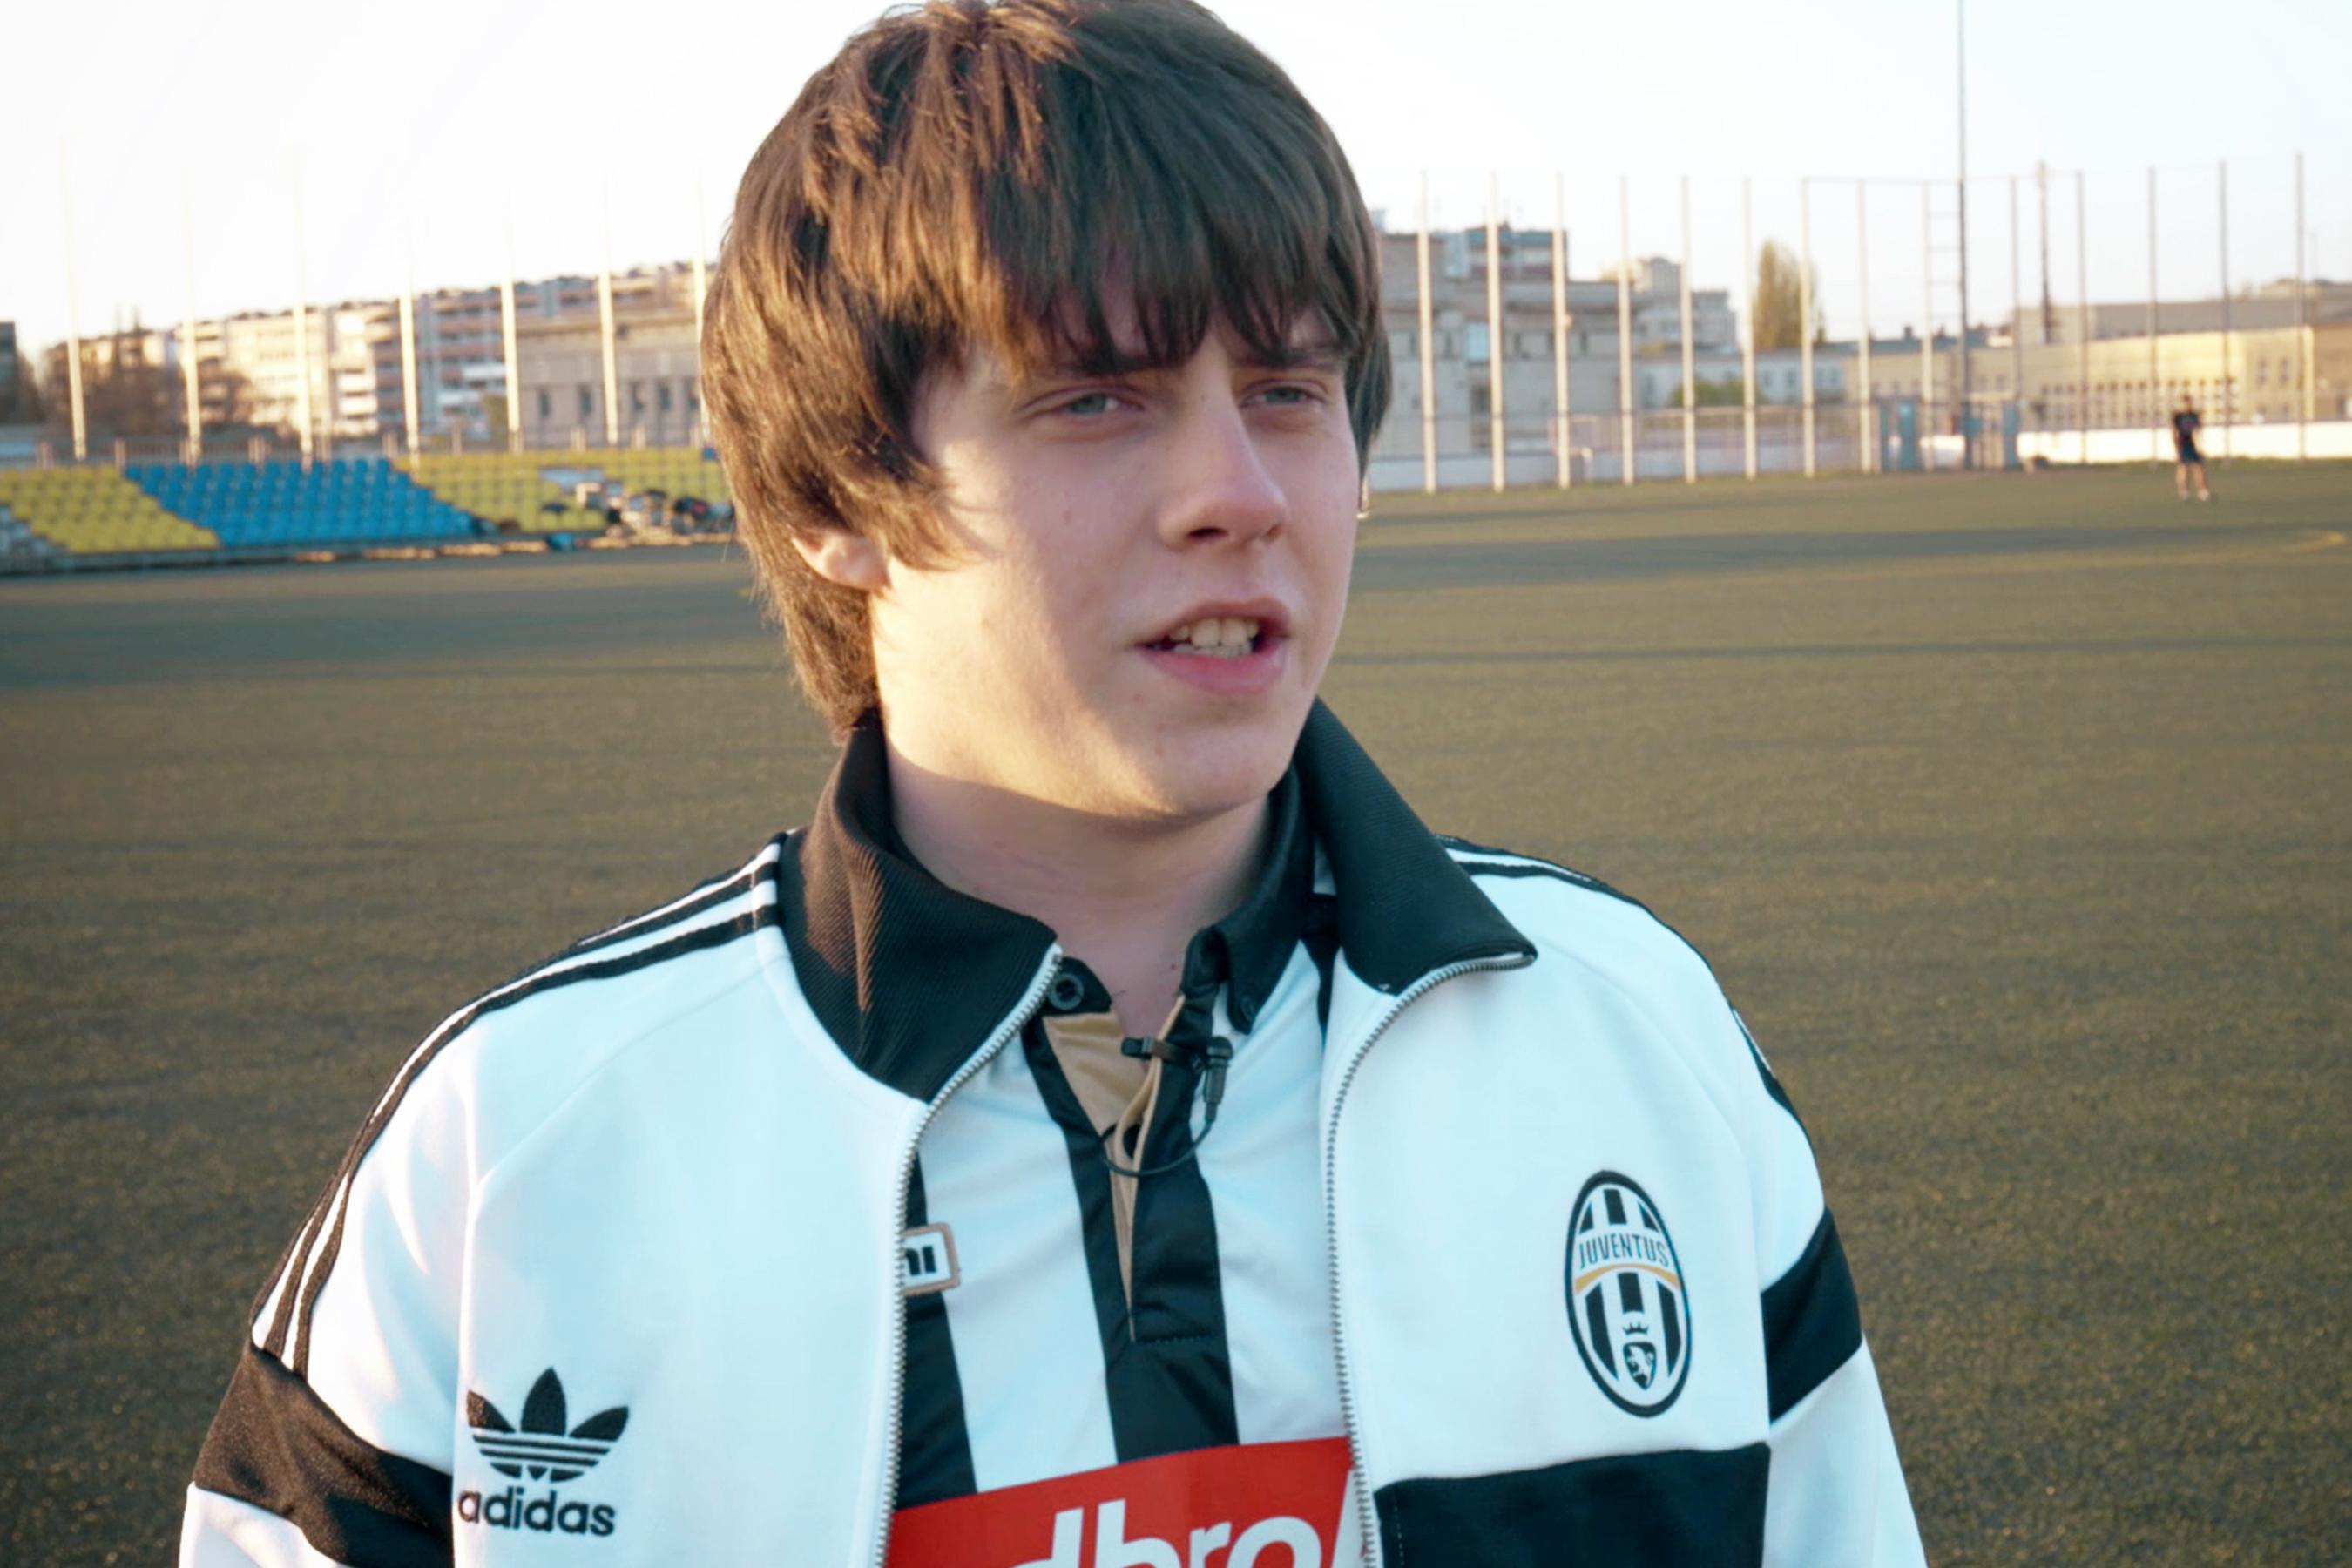 Jake Bugg, Kurzinterview (Football vs. Music)